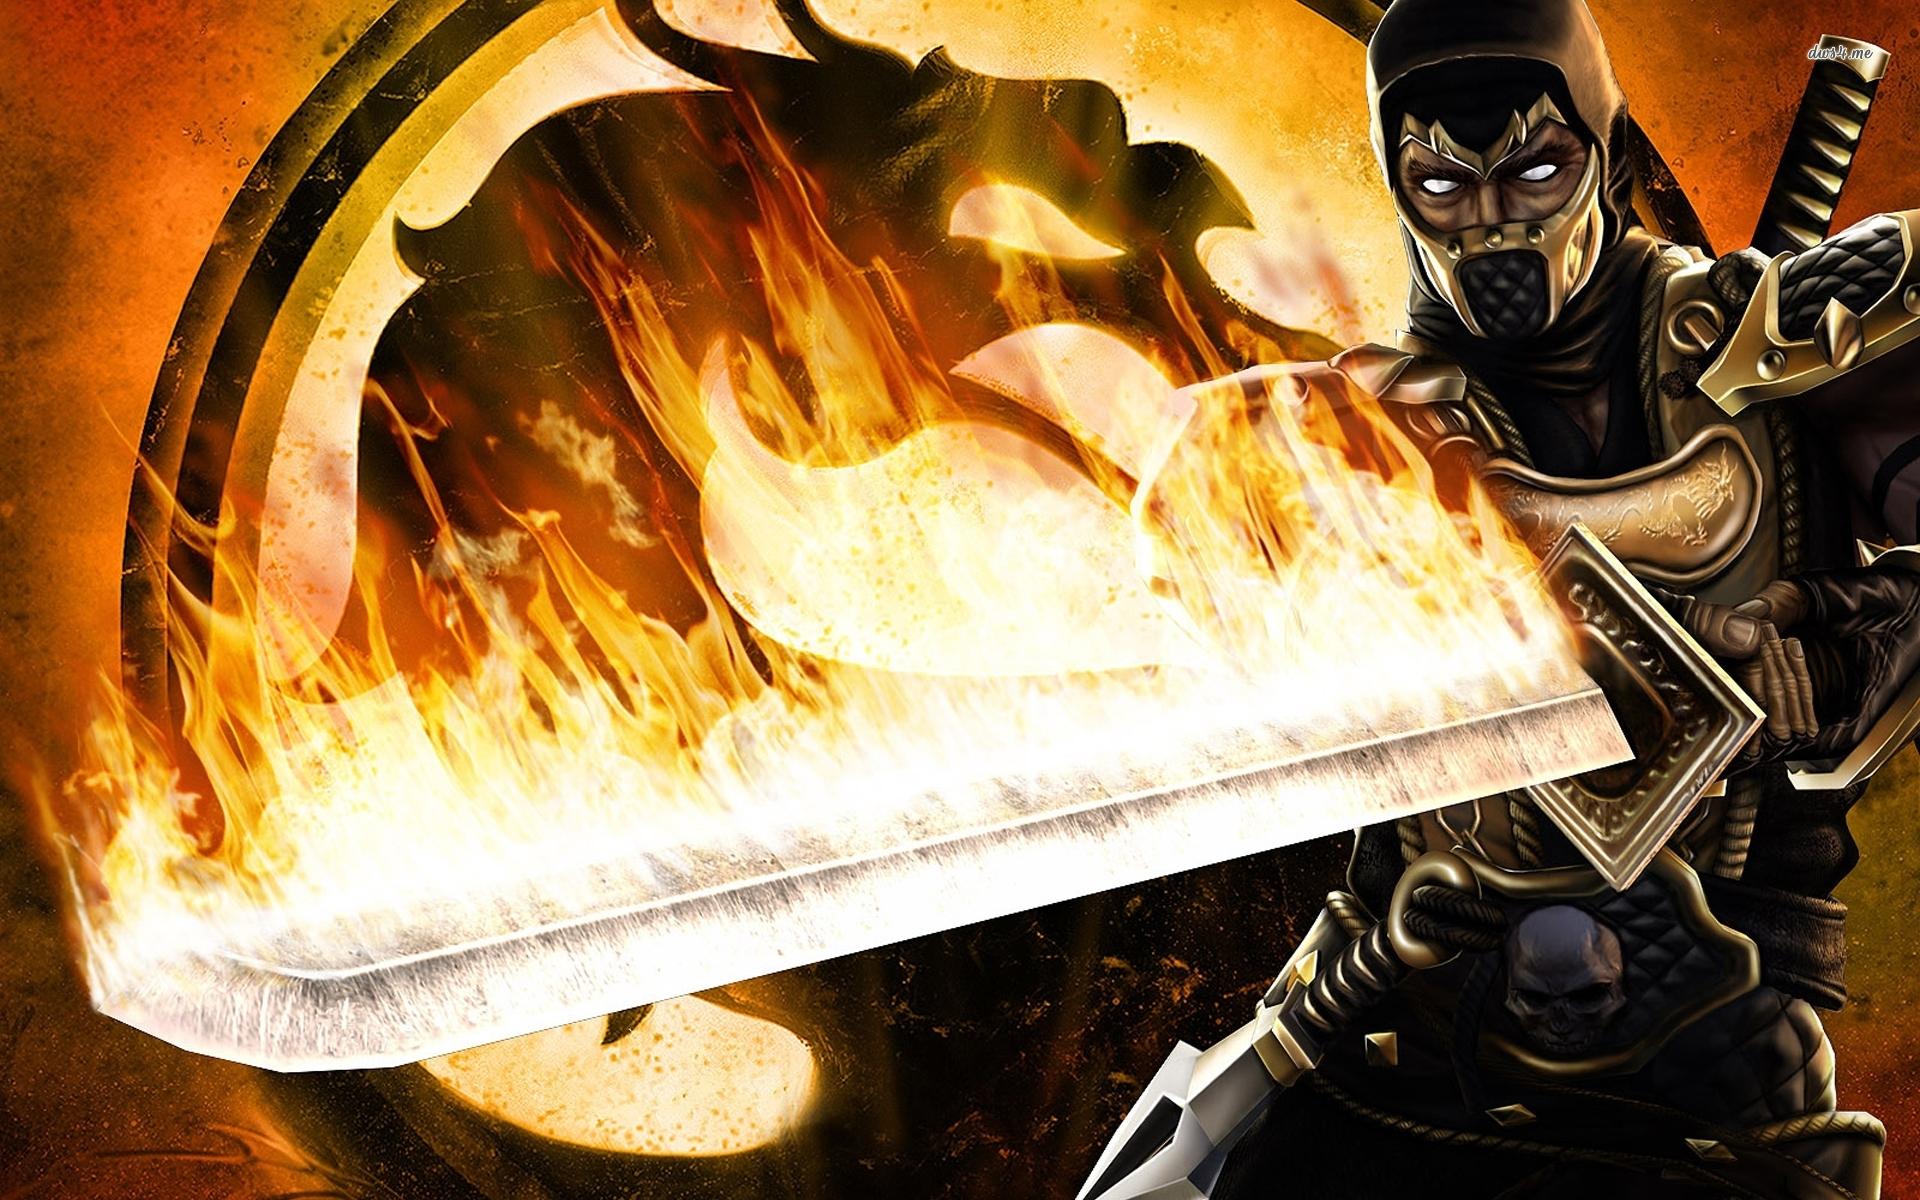 Mortal Kombat Logo A1 Hd Desktop Wallpapers 4k Hd